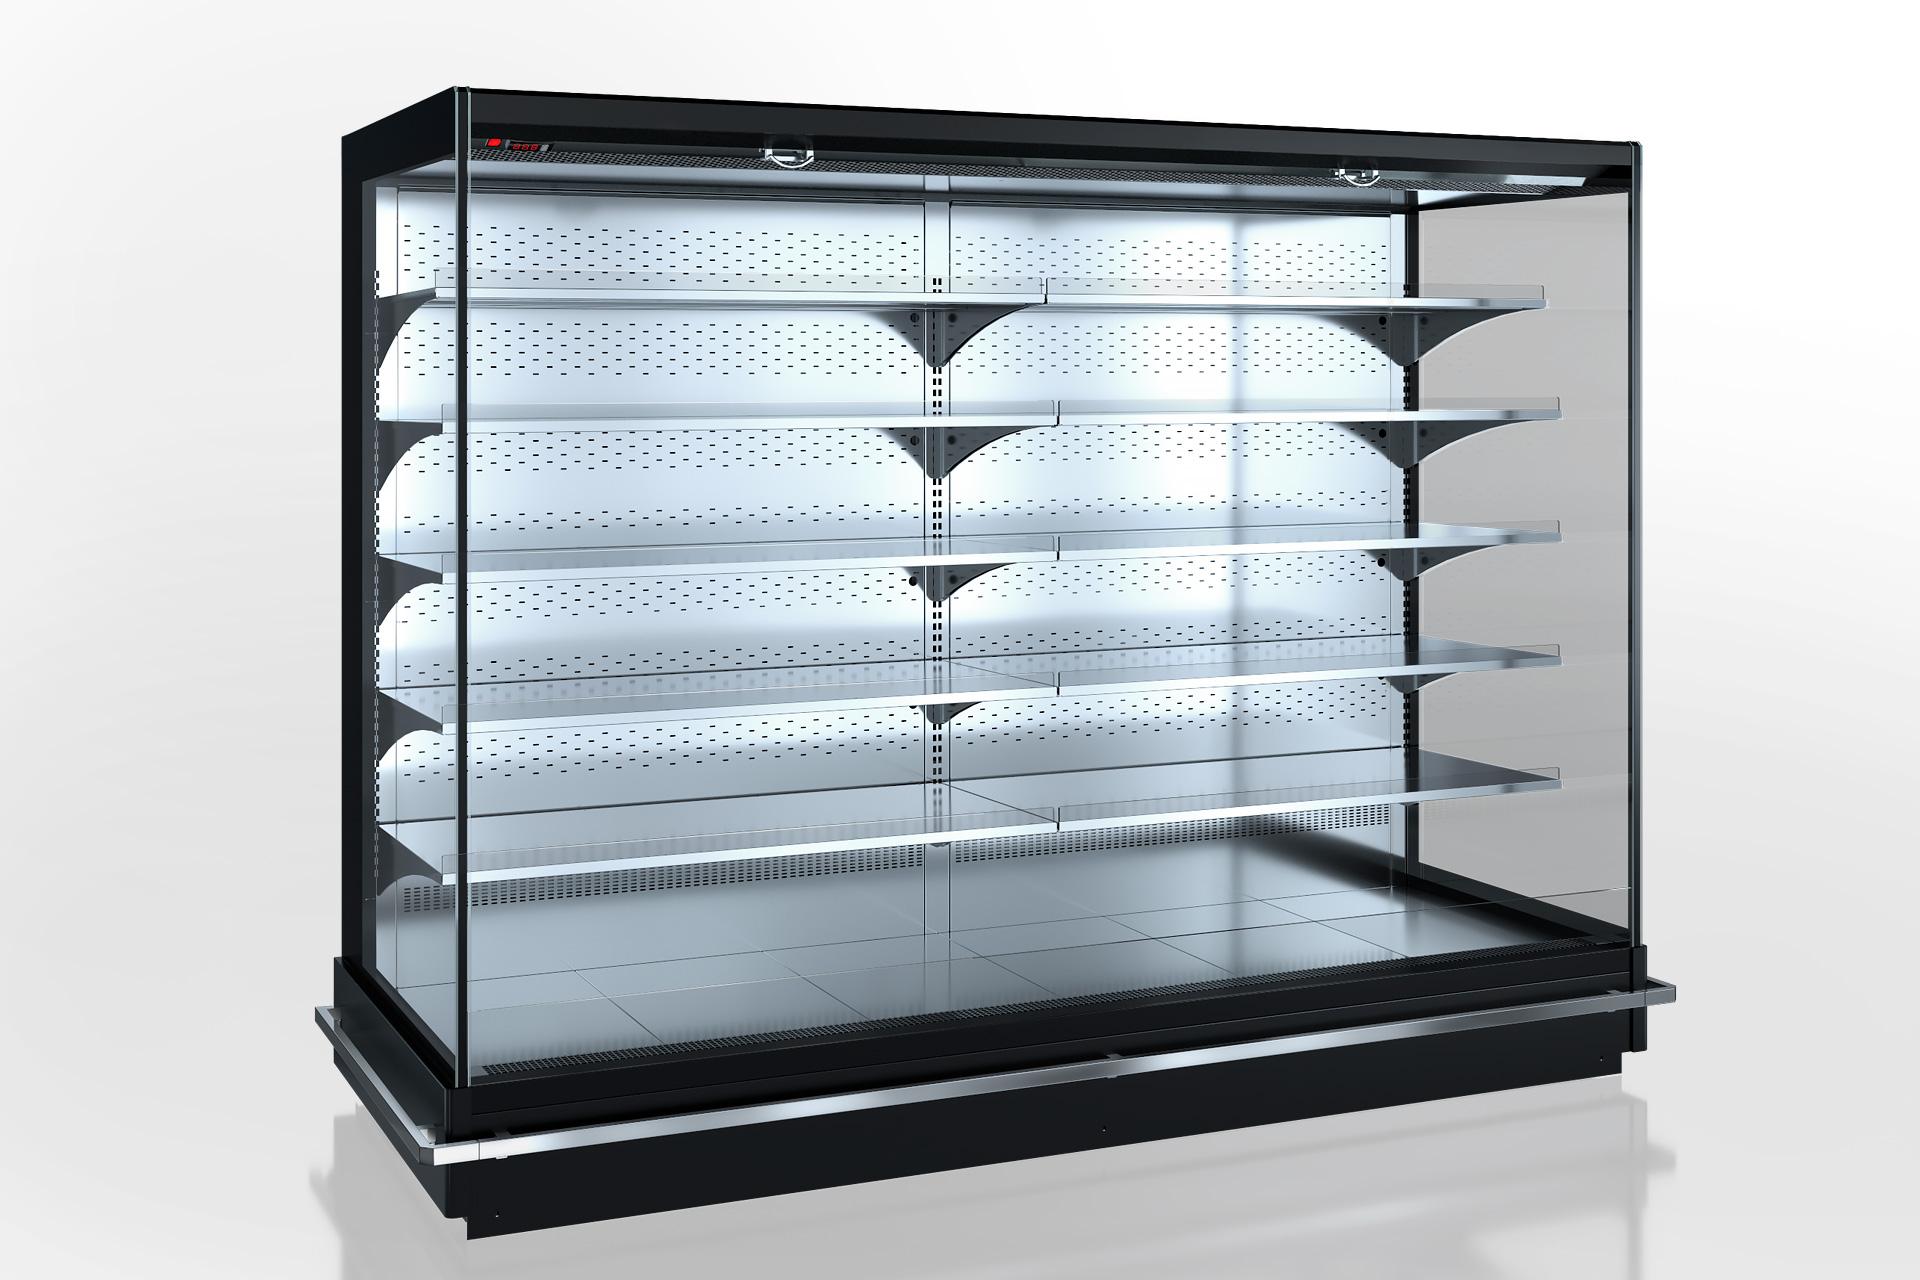 Refrigerated multideck cabinets Indiana MV 105 MT O 205-DLM